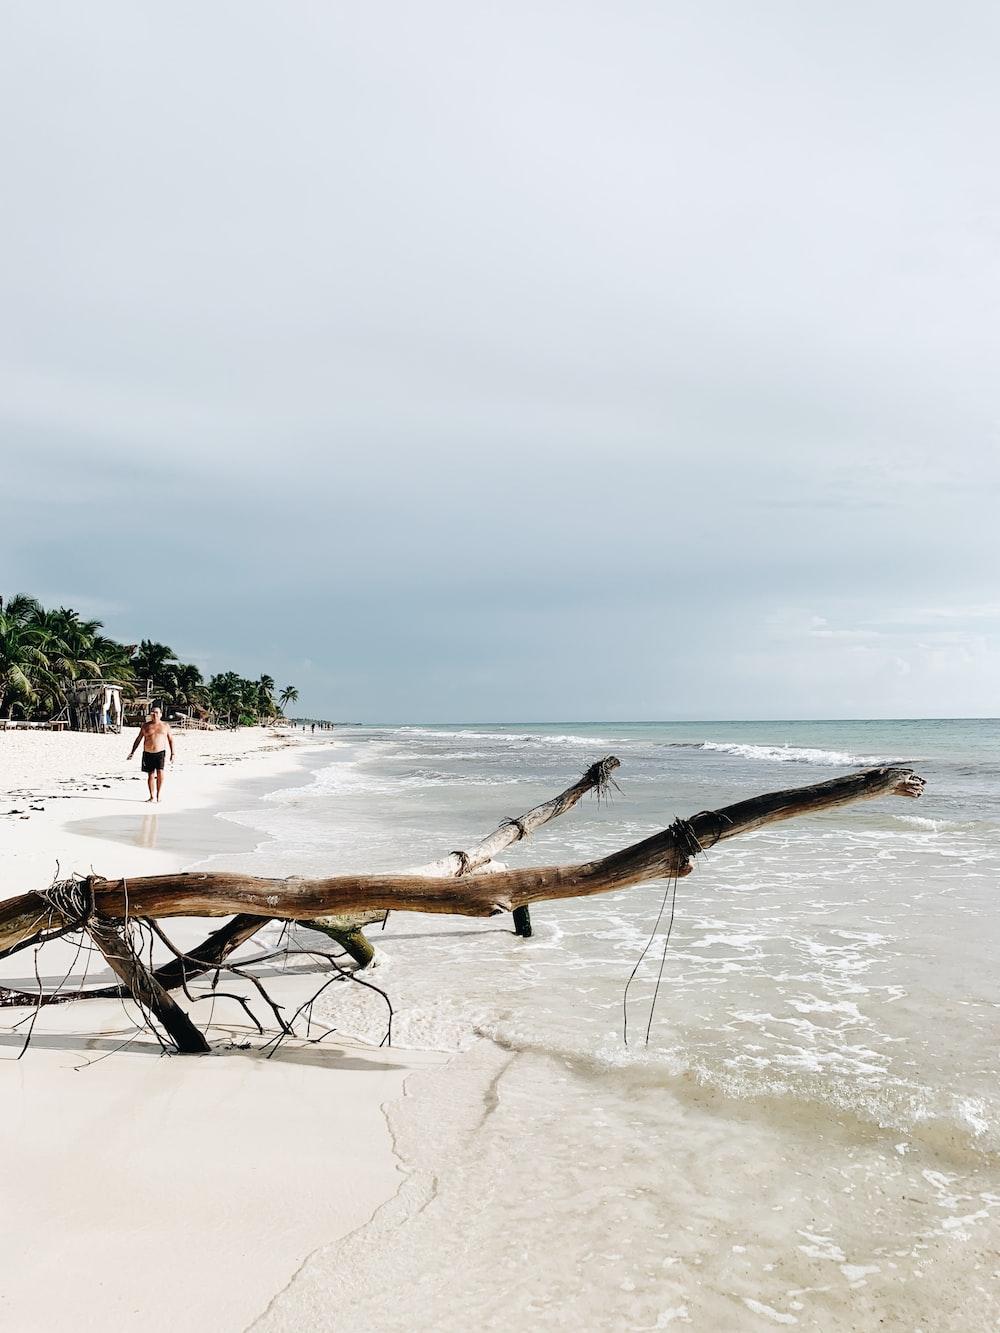 brown tree branch on white sand beach during daytime